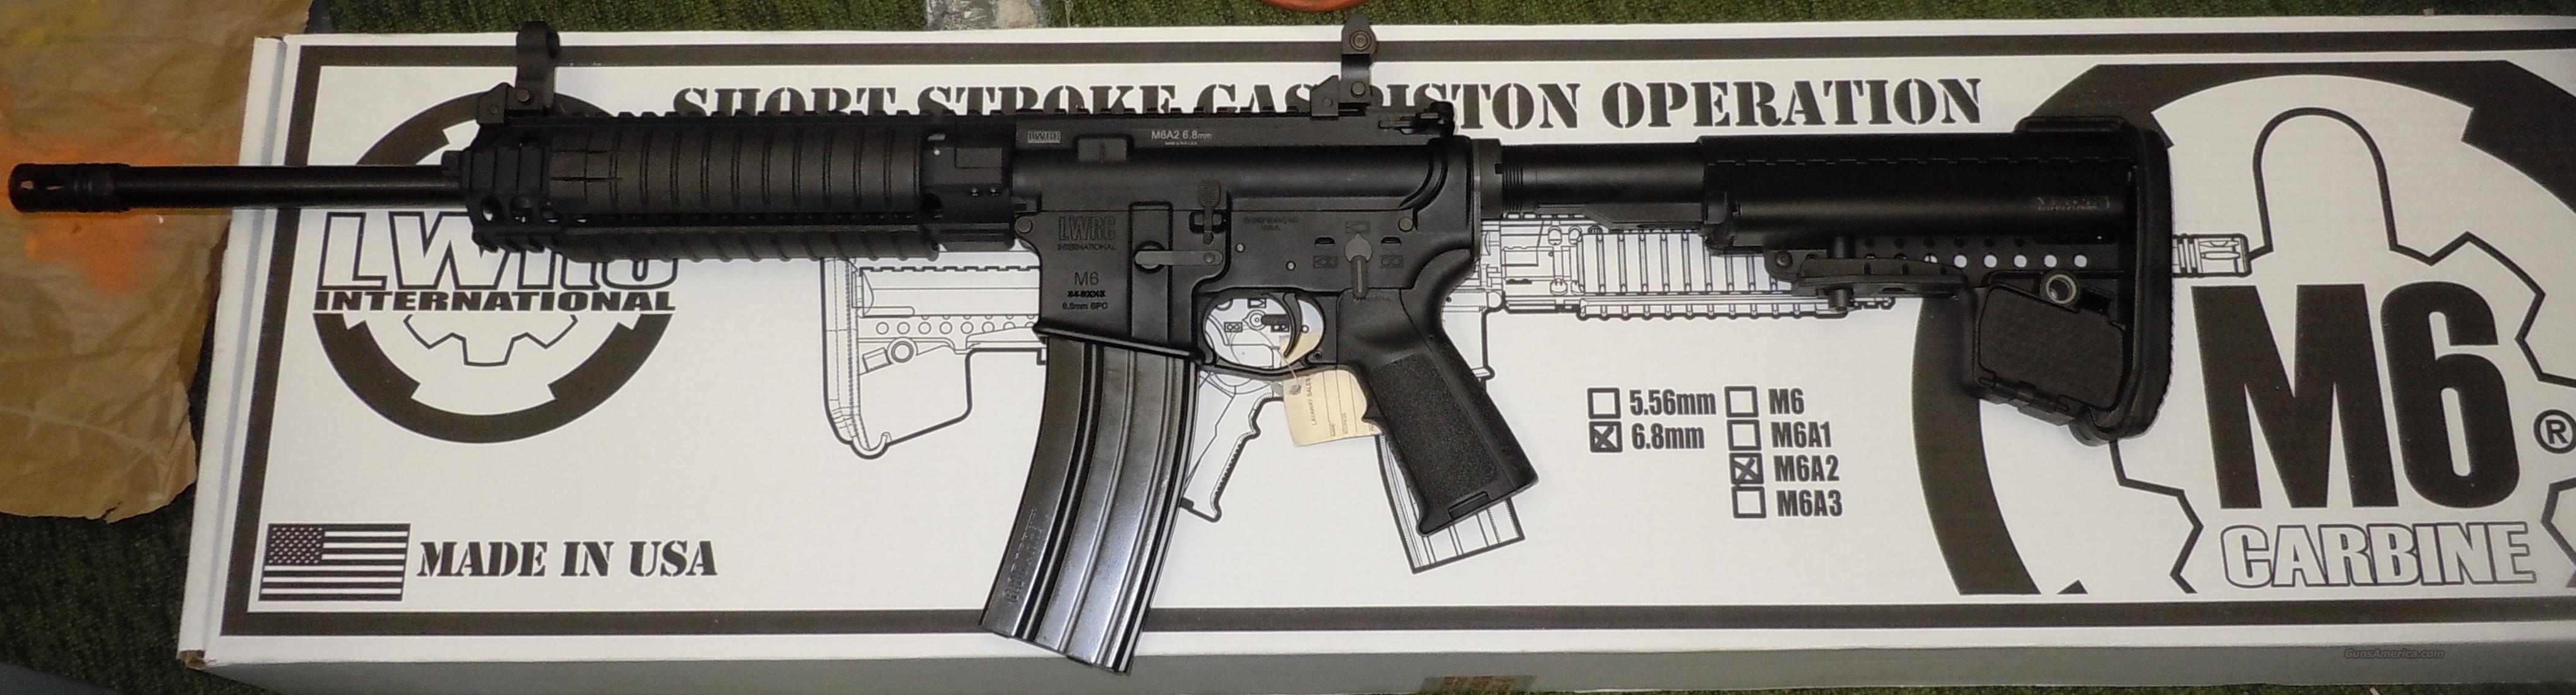 LWRC M6A2 6.8MM SHORT STROKE PISTON RIFLE  Guns > Rifles > AR-15 Rifles - Small Manufacturers > Complete Rifle